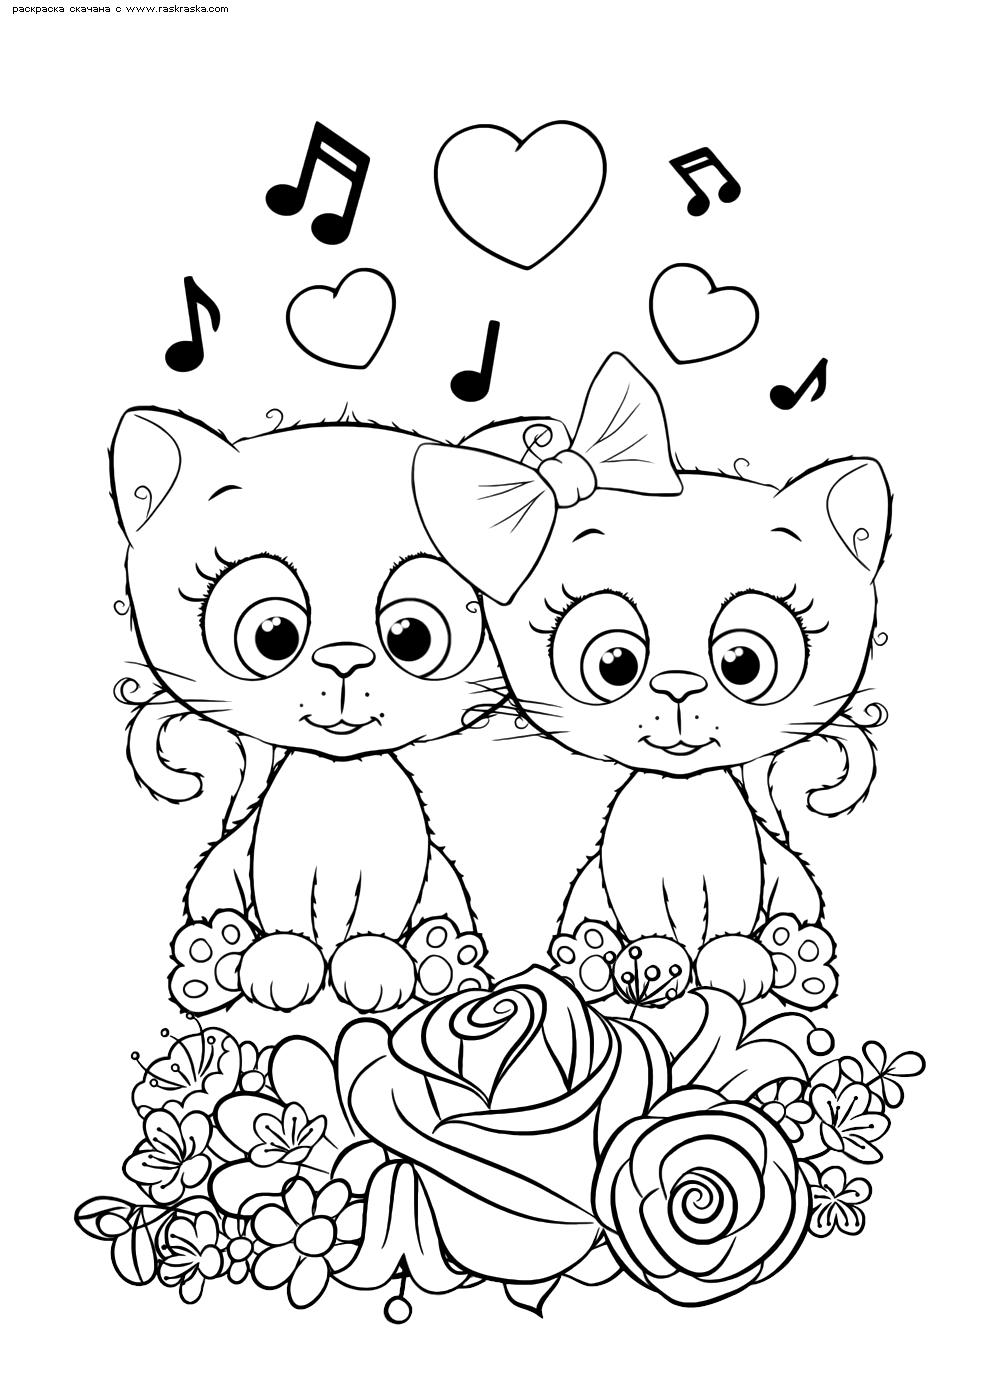 Раскраска Котята | Раскраски няшных животных. Милые ...